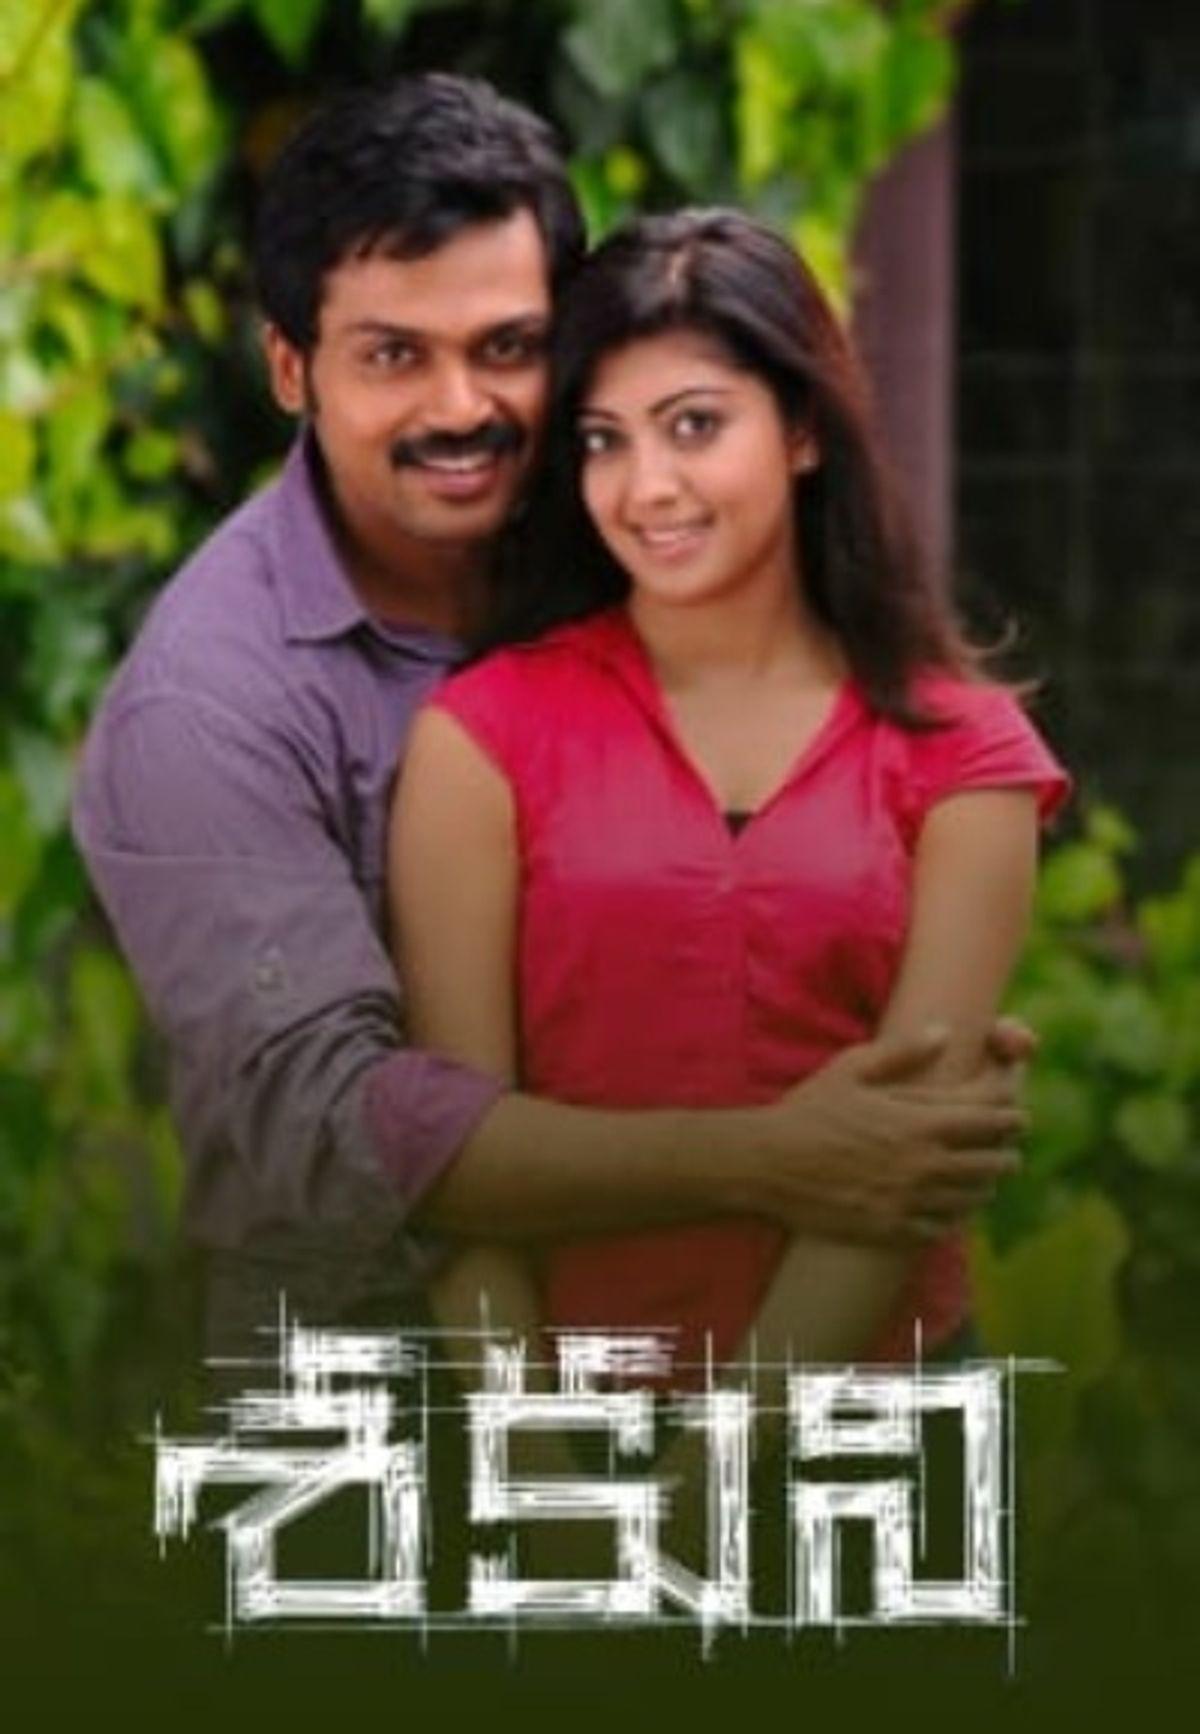 Kota Srinivasa Rao Best Movies, TV Shows and Web Series List